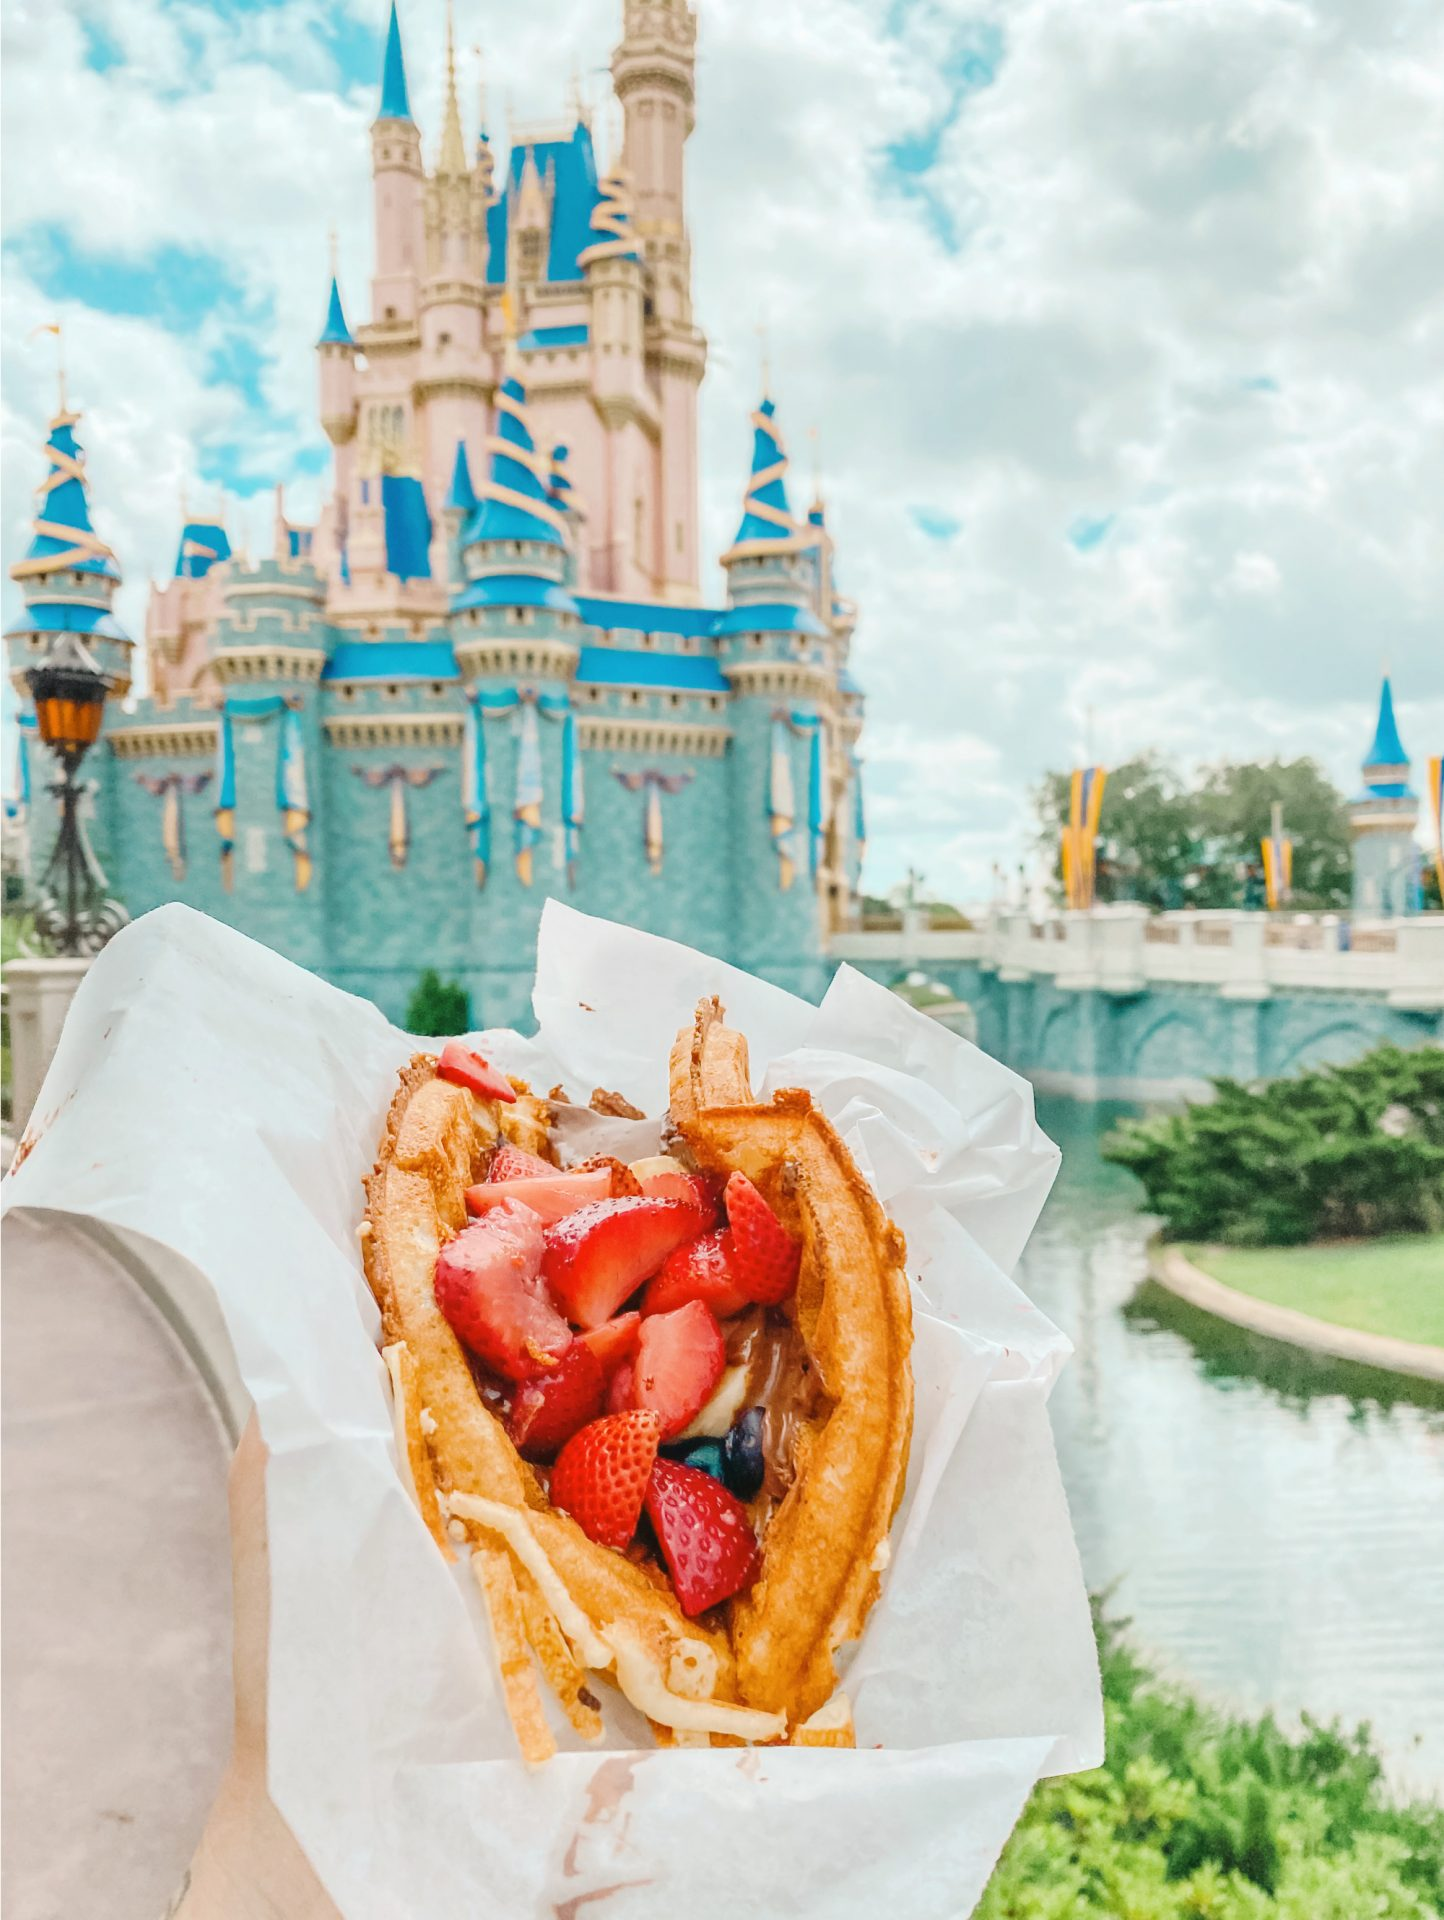 walt disney world, what to eat 2021, magic kingdom, sleepy hollow, Nutella fruit waffle, best food at disney, magic king doom food, disney travel blog, best disney, ultimate guide to disney